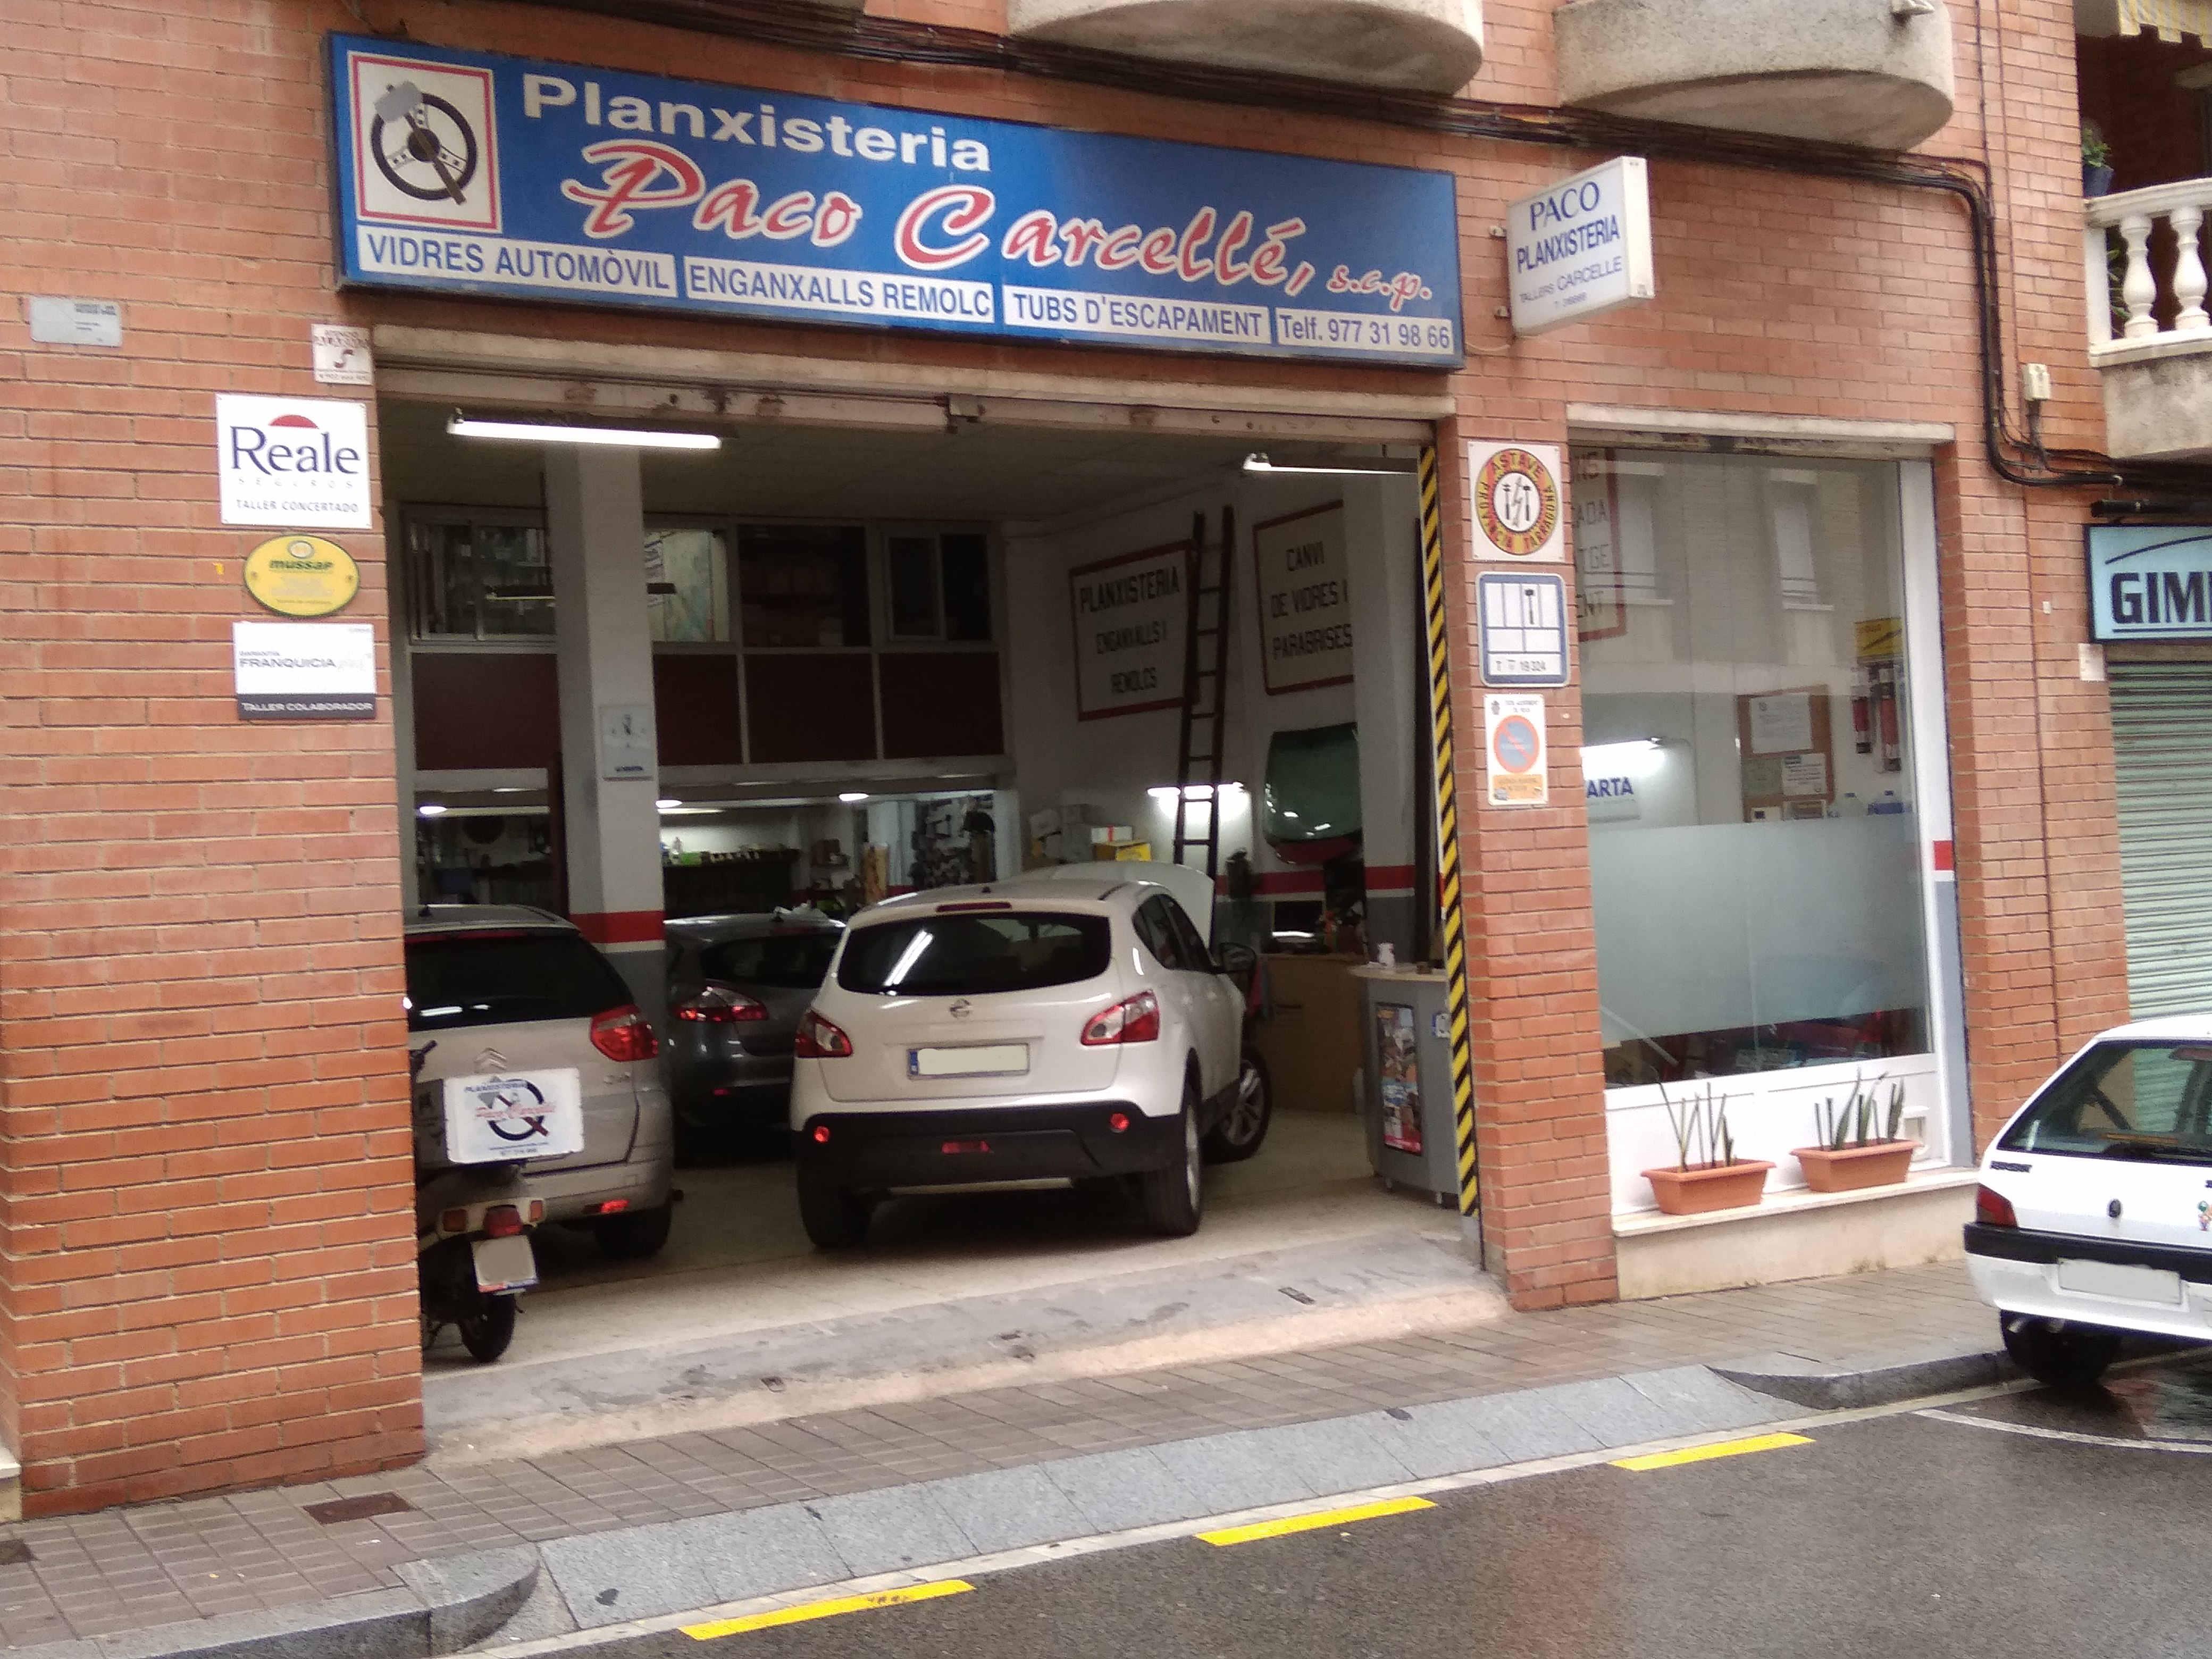 Presentació Planxisteria Paco Carcelle Reus